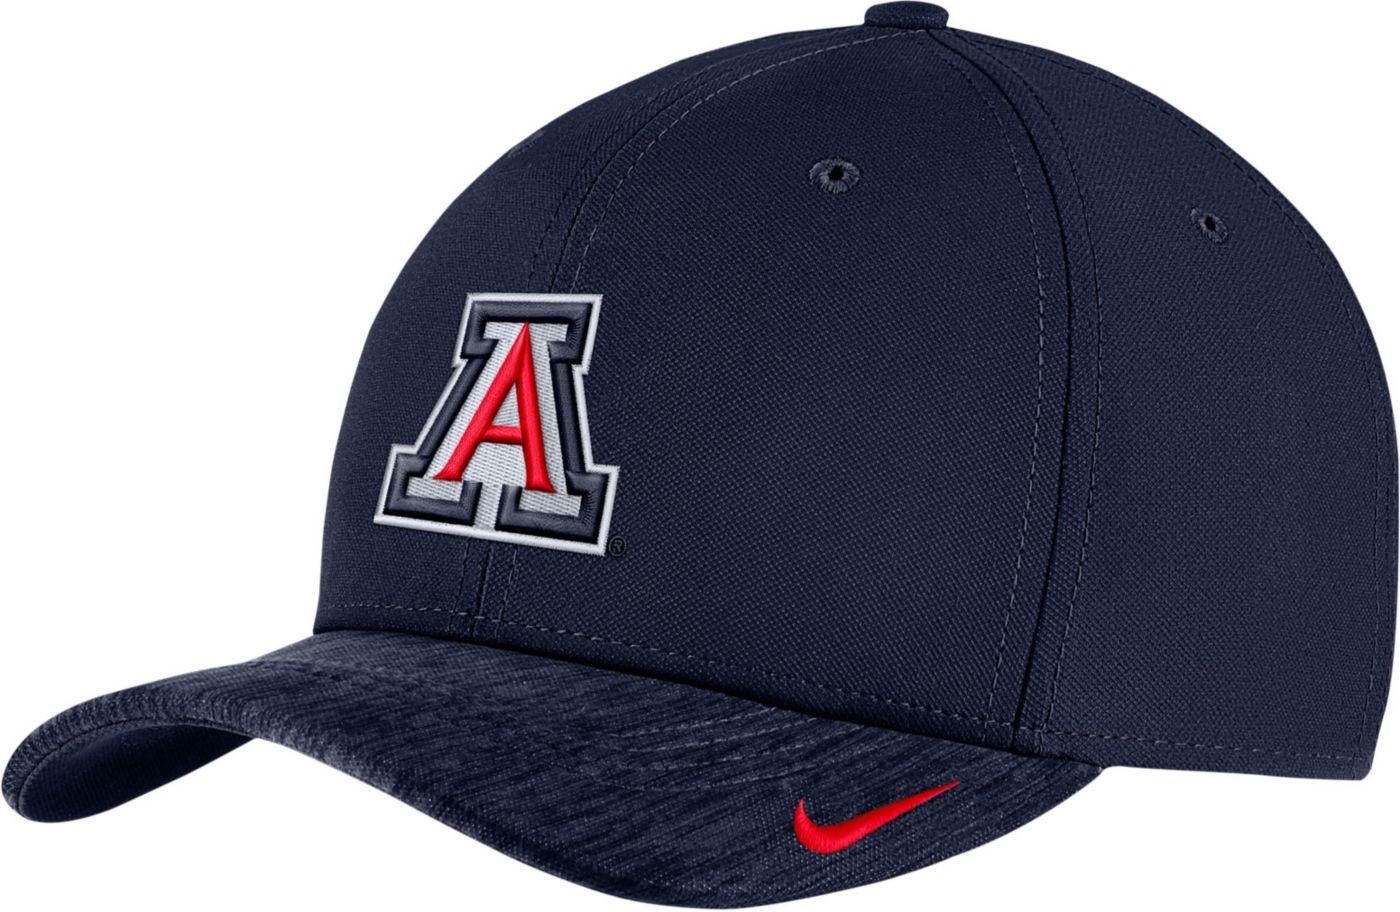 Nike Men's Arizona Wildcats Navy Aerobill Swoosh Flex Classic99 Football Sideline Hat